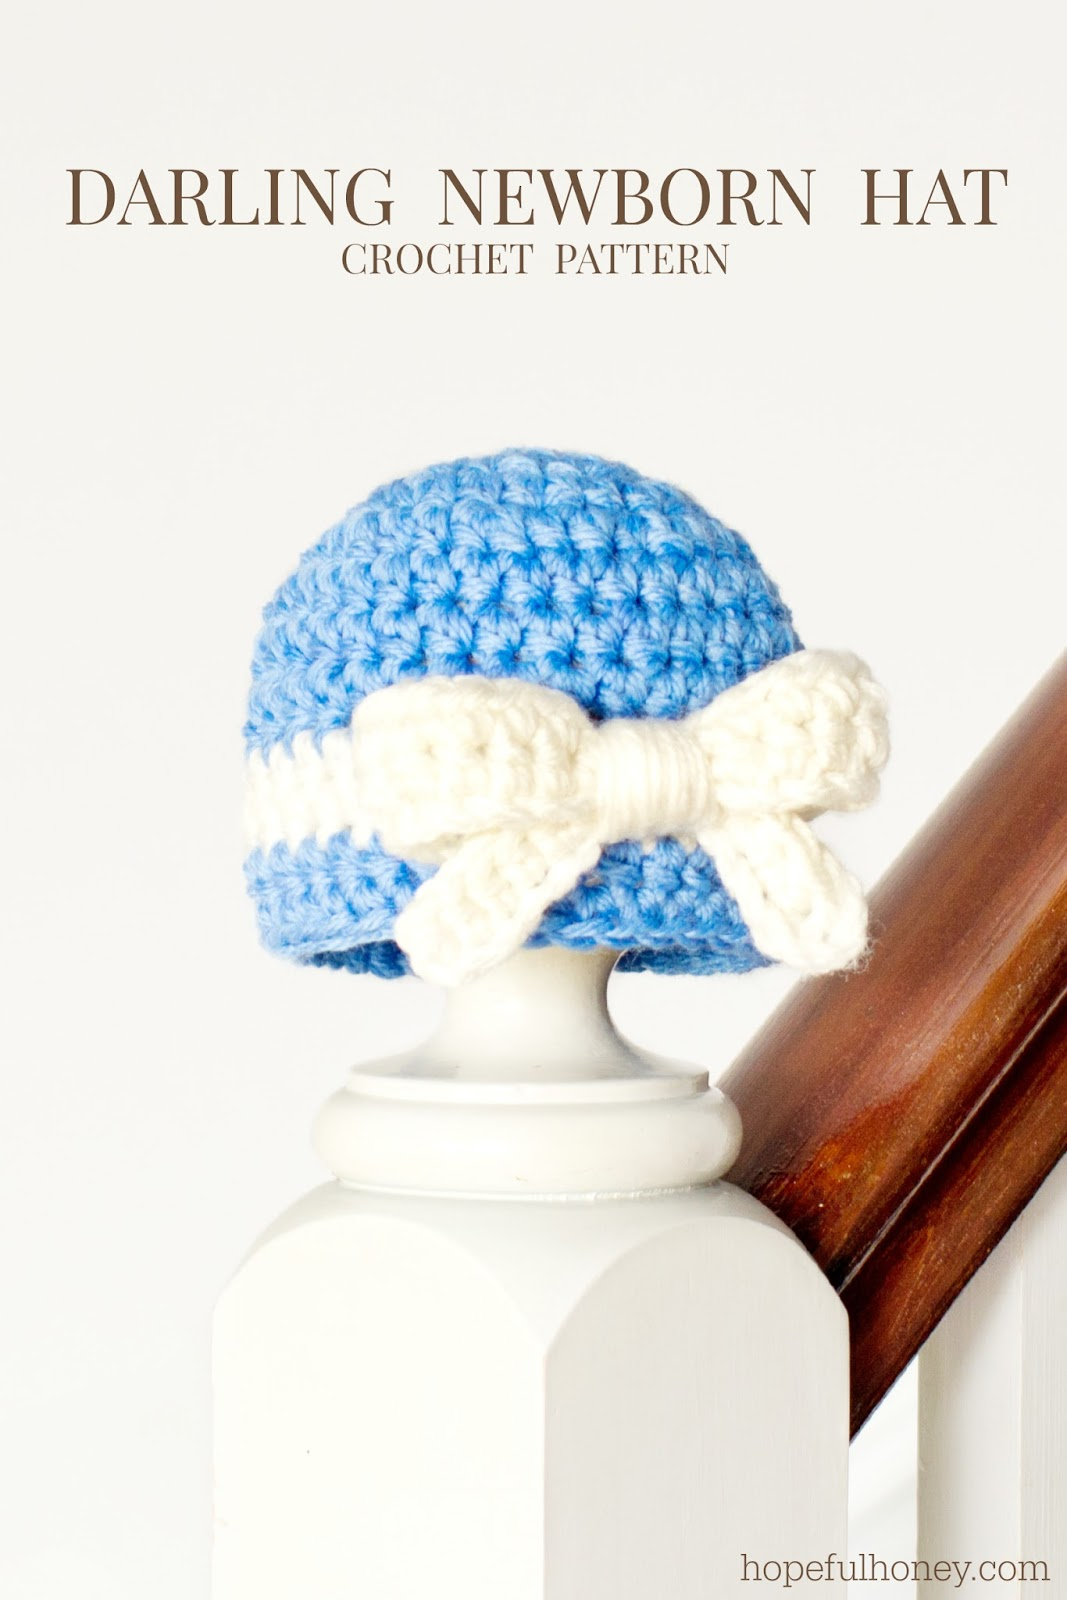 Crochet Baby Hat Pattern With Bow : Hopeful Honey Craft, Crochet, Create: Darling Newborn ...